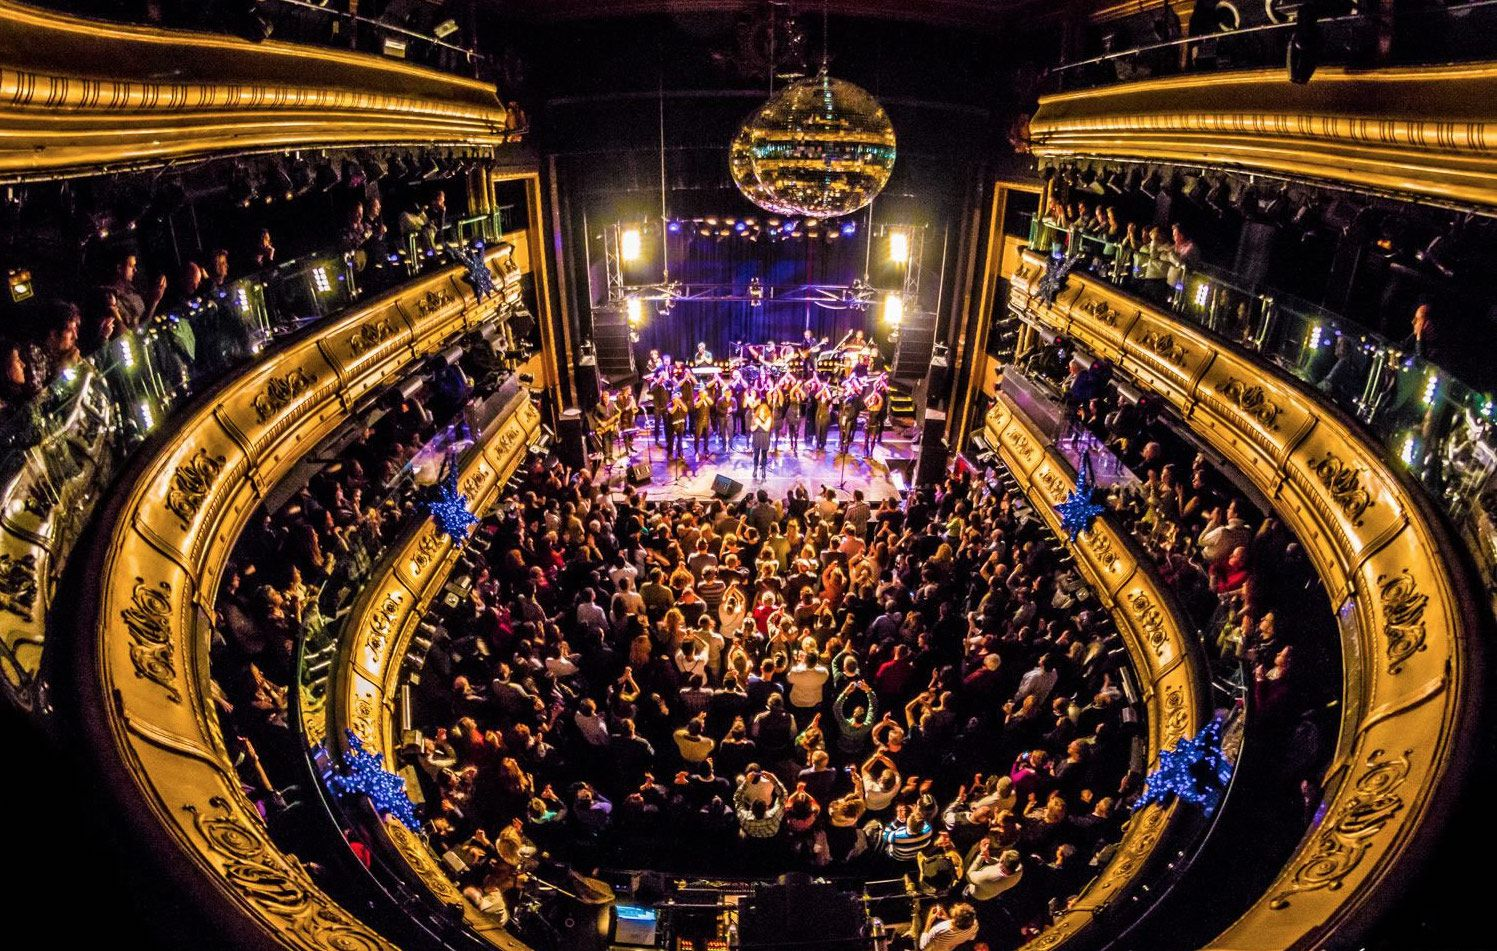 Teatro Kapital, Μαδρίτη, Ισπανία, Ευρώπη